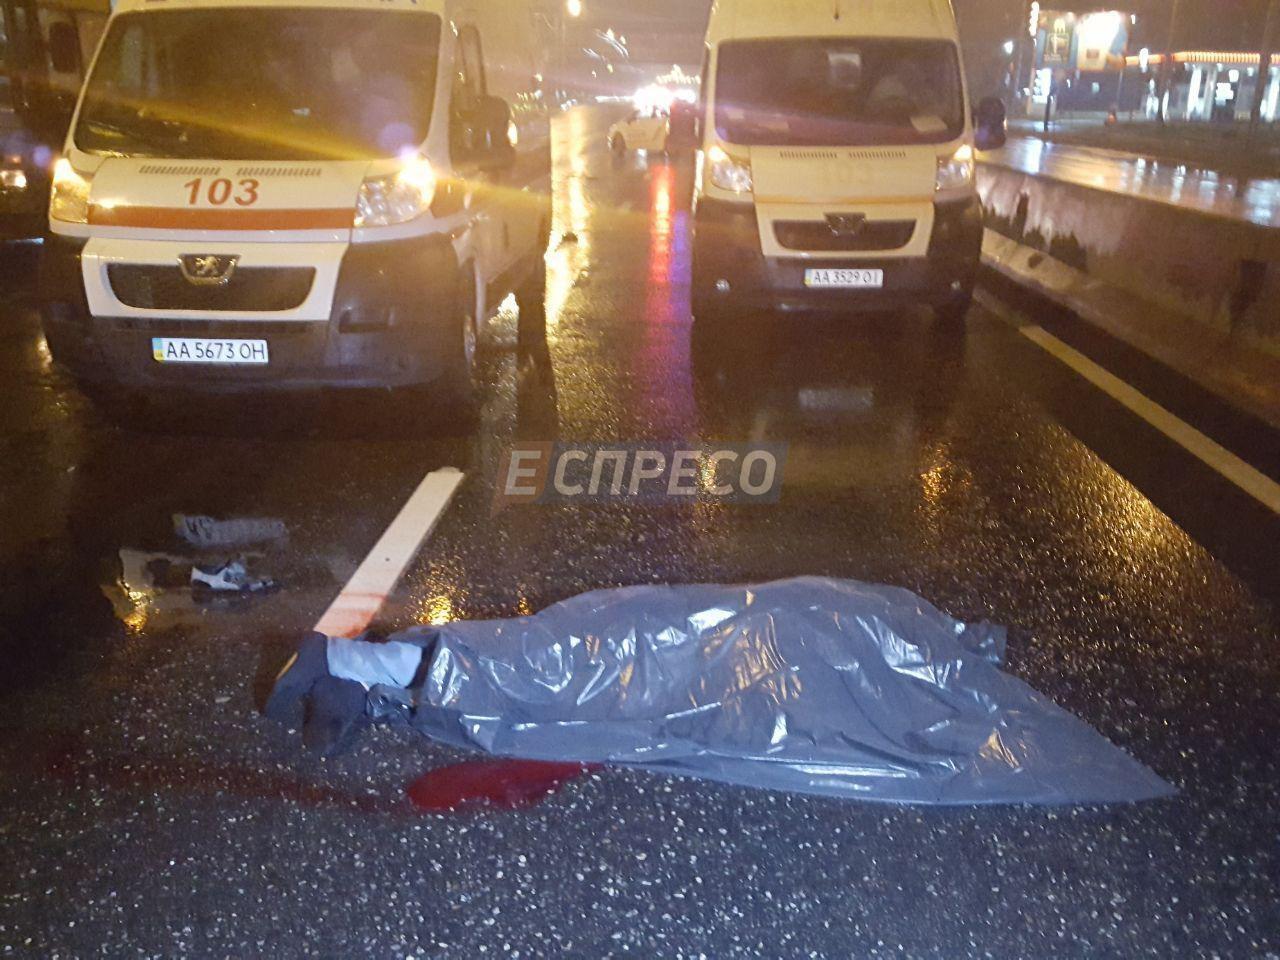 На проспекте Ватутина в нелепом ДТП погиб водитель троллейбуса